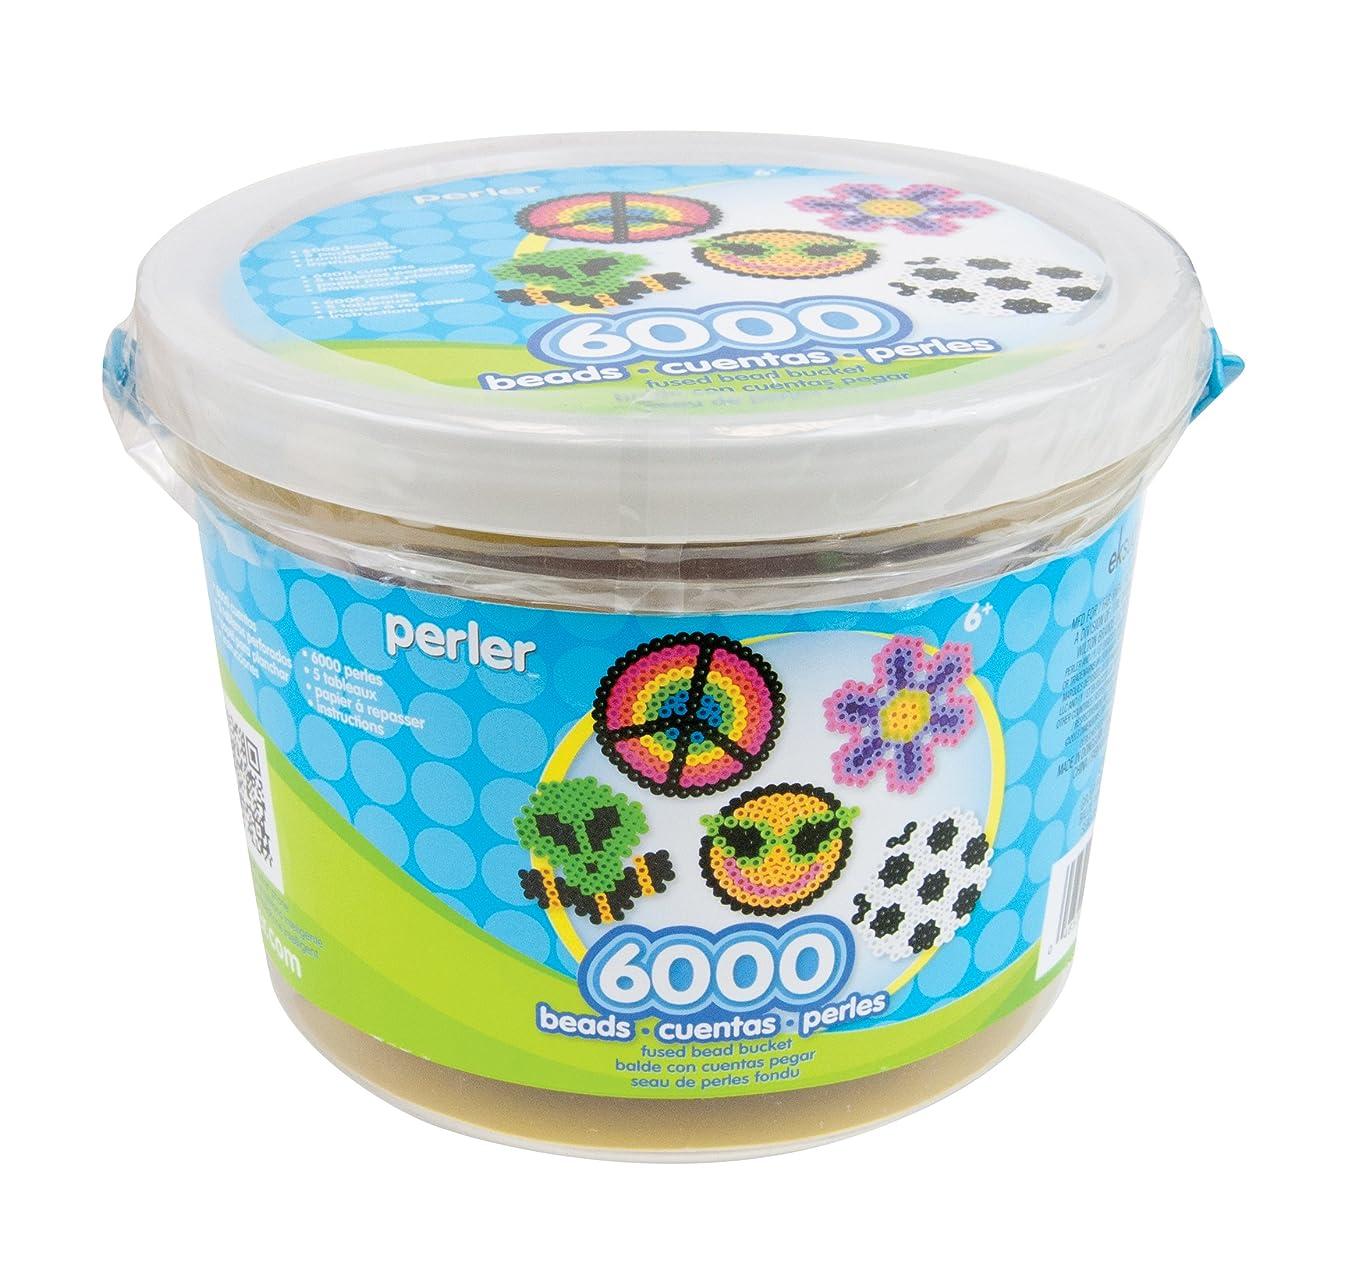 Perler Multi Mix Assorted Fuse Bead Bucket, 6006 pcs